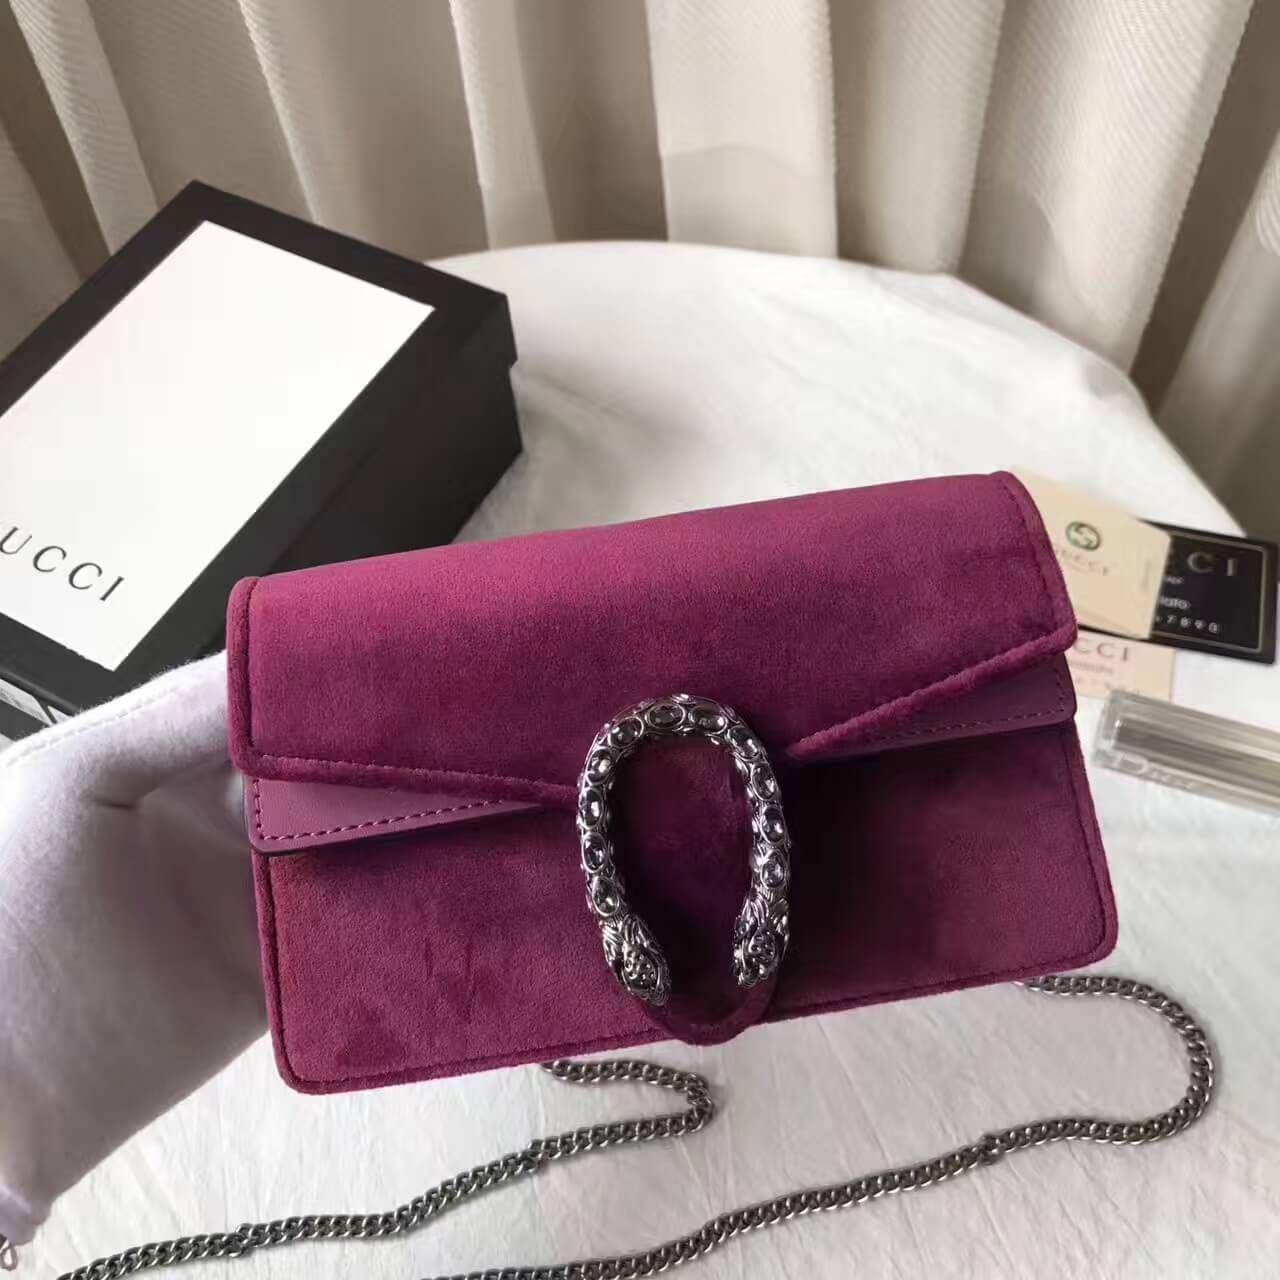 5c4b163096aa Gucci Dionysus Velvet Super Mini Bag 476432 Fuchsia 2017 | Gucci ...